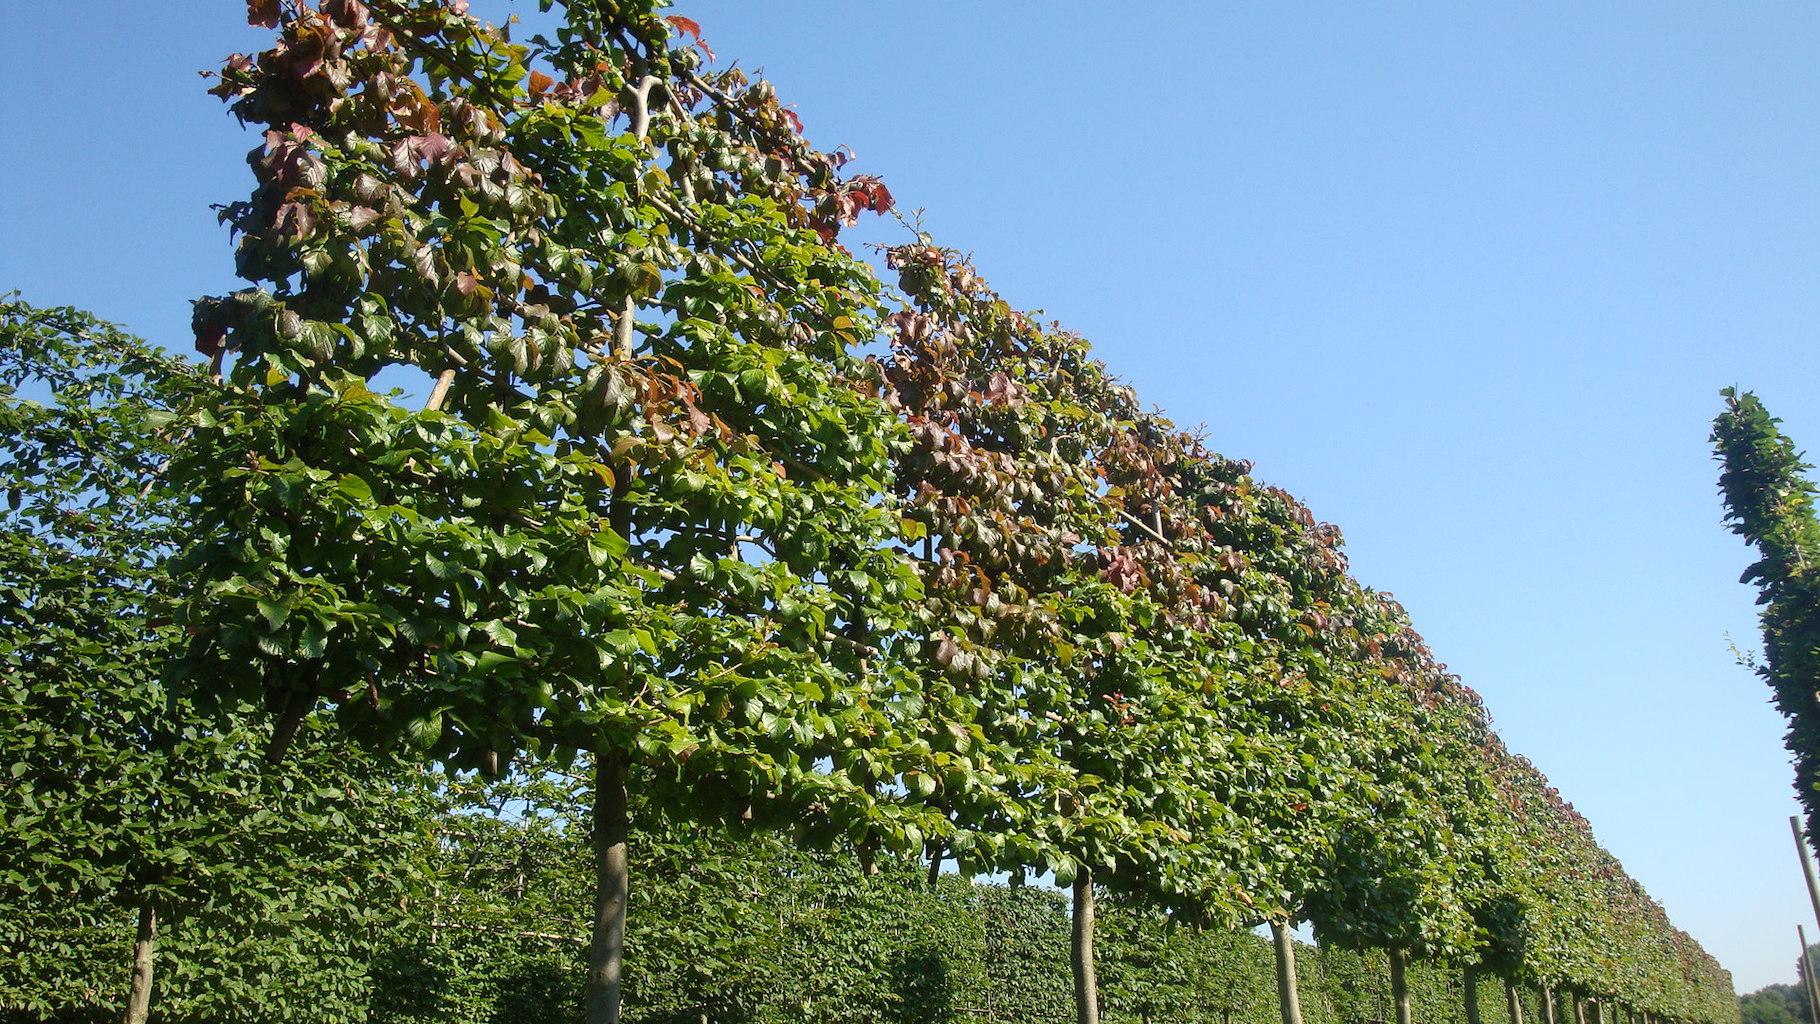 Parrotia persica (Persian Ironwood) pleached screens 20-25 grade